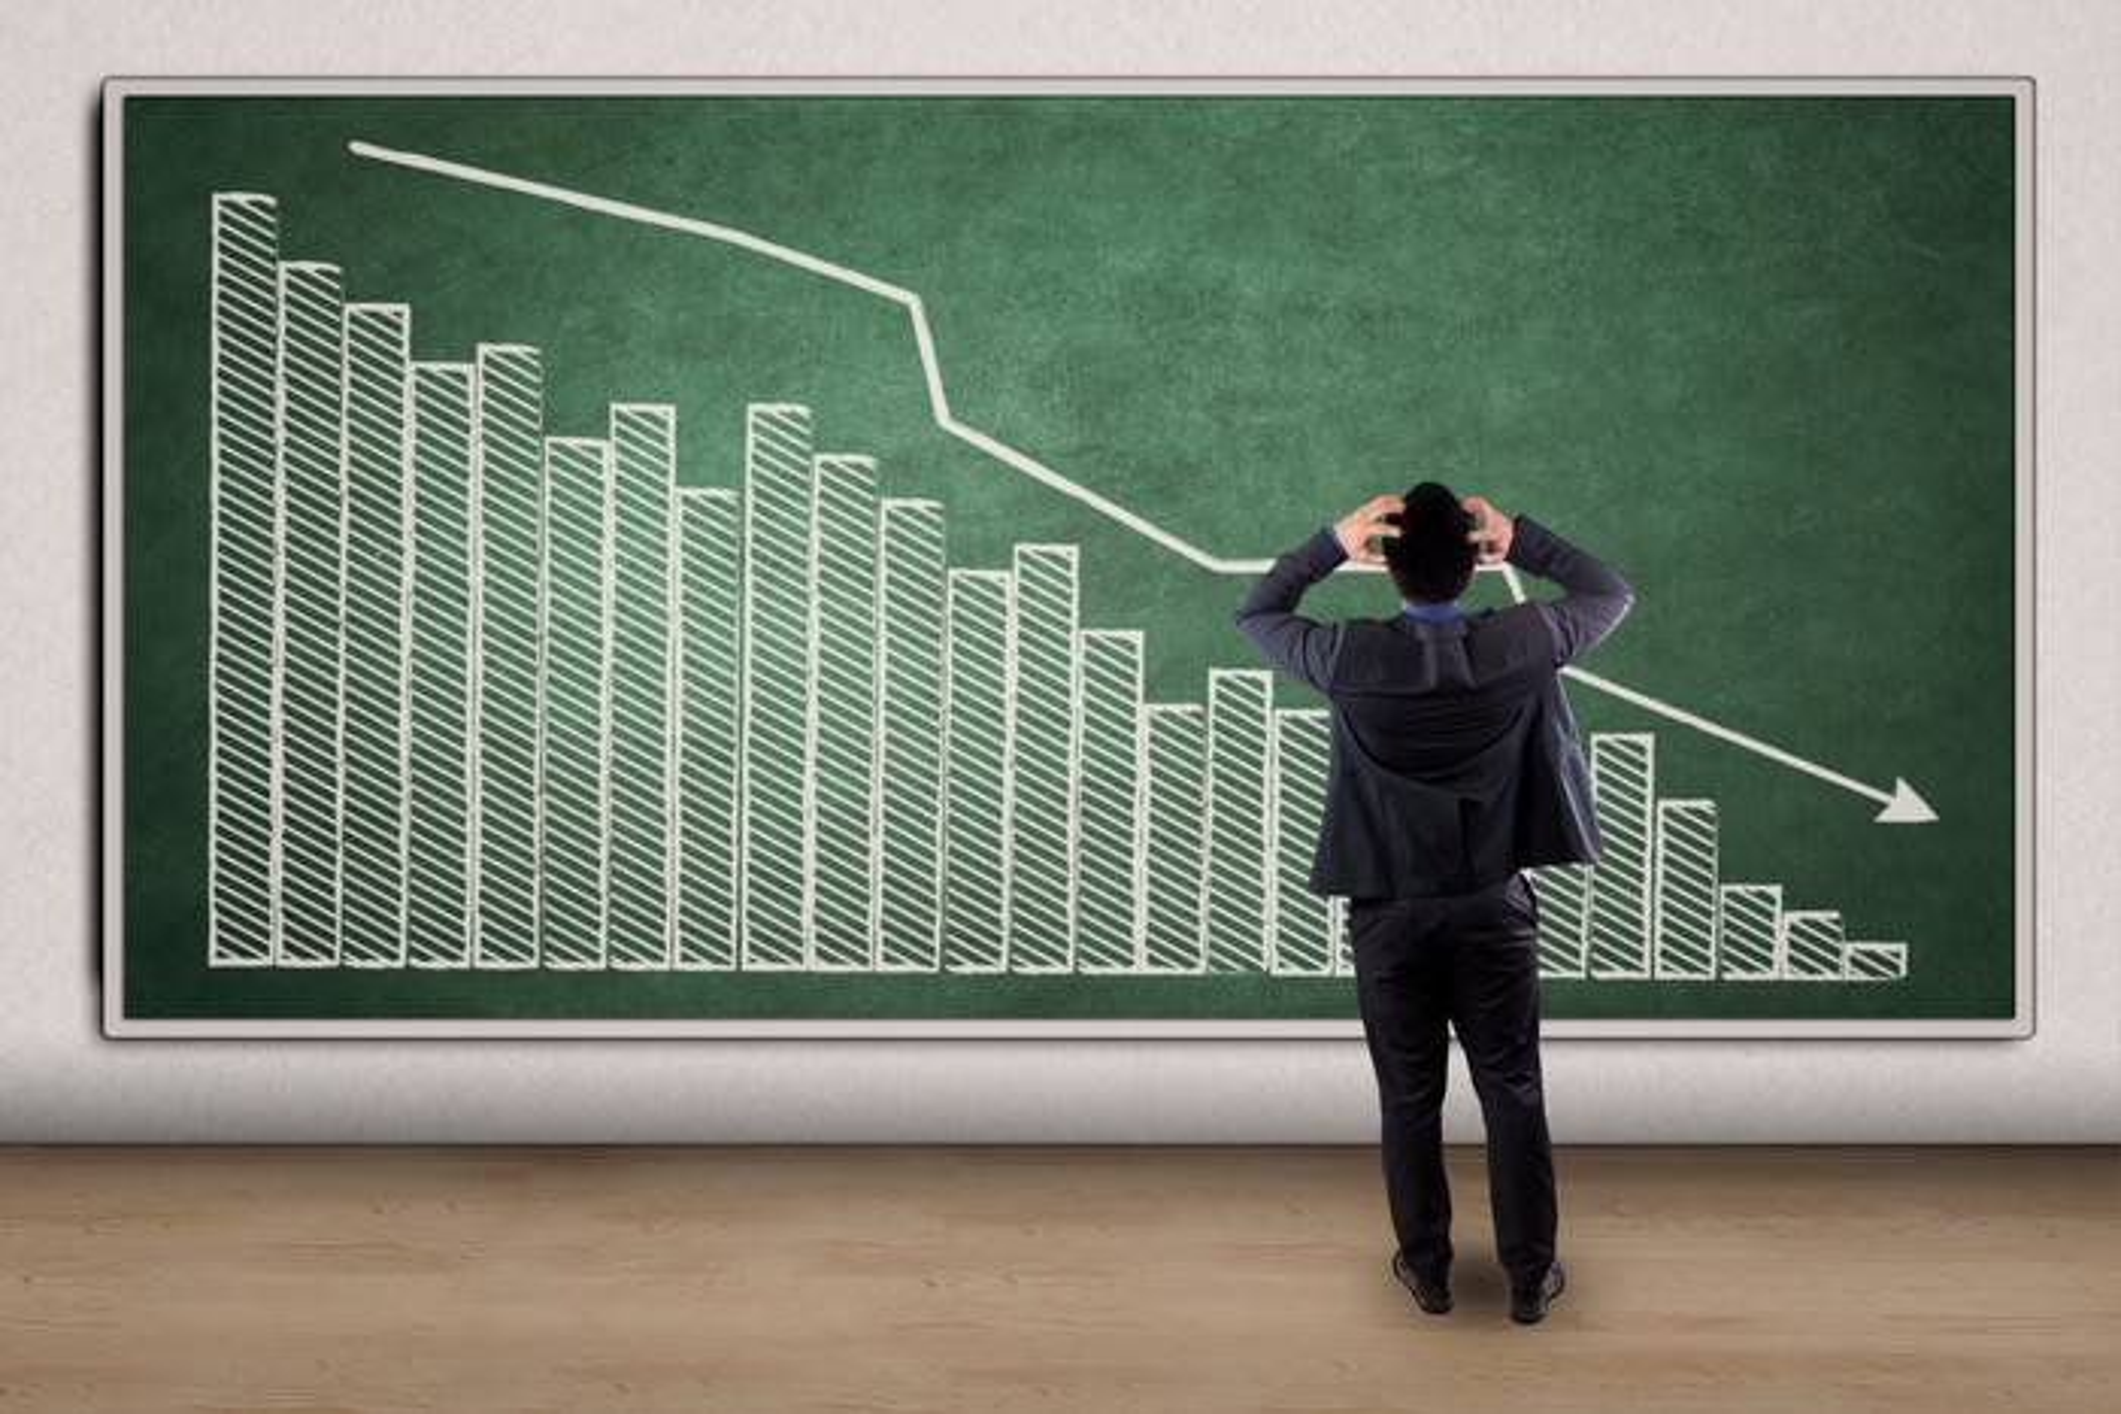 A businessman agonizes over a declining chart.